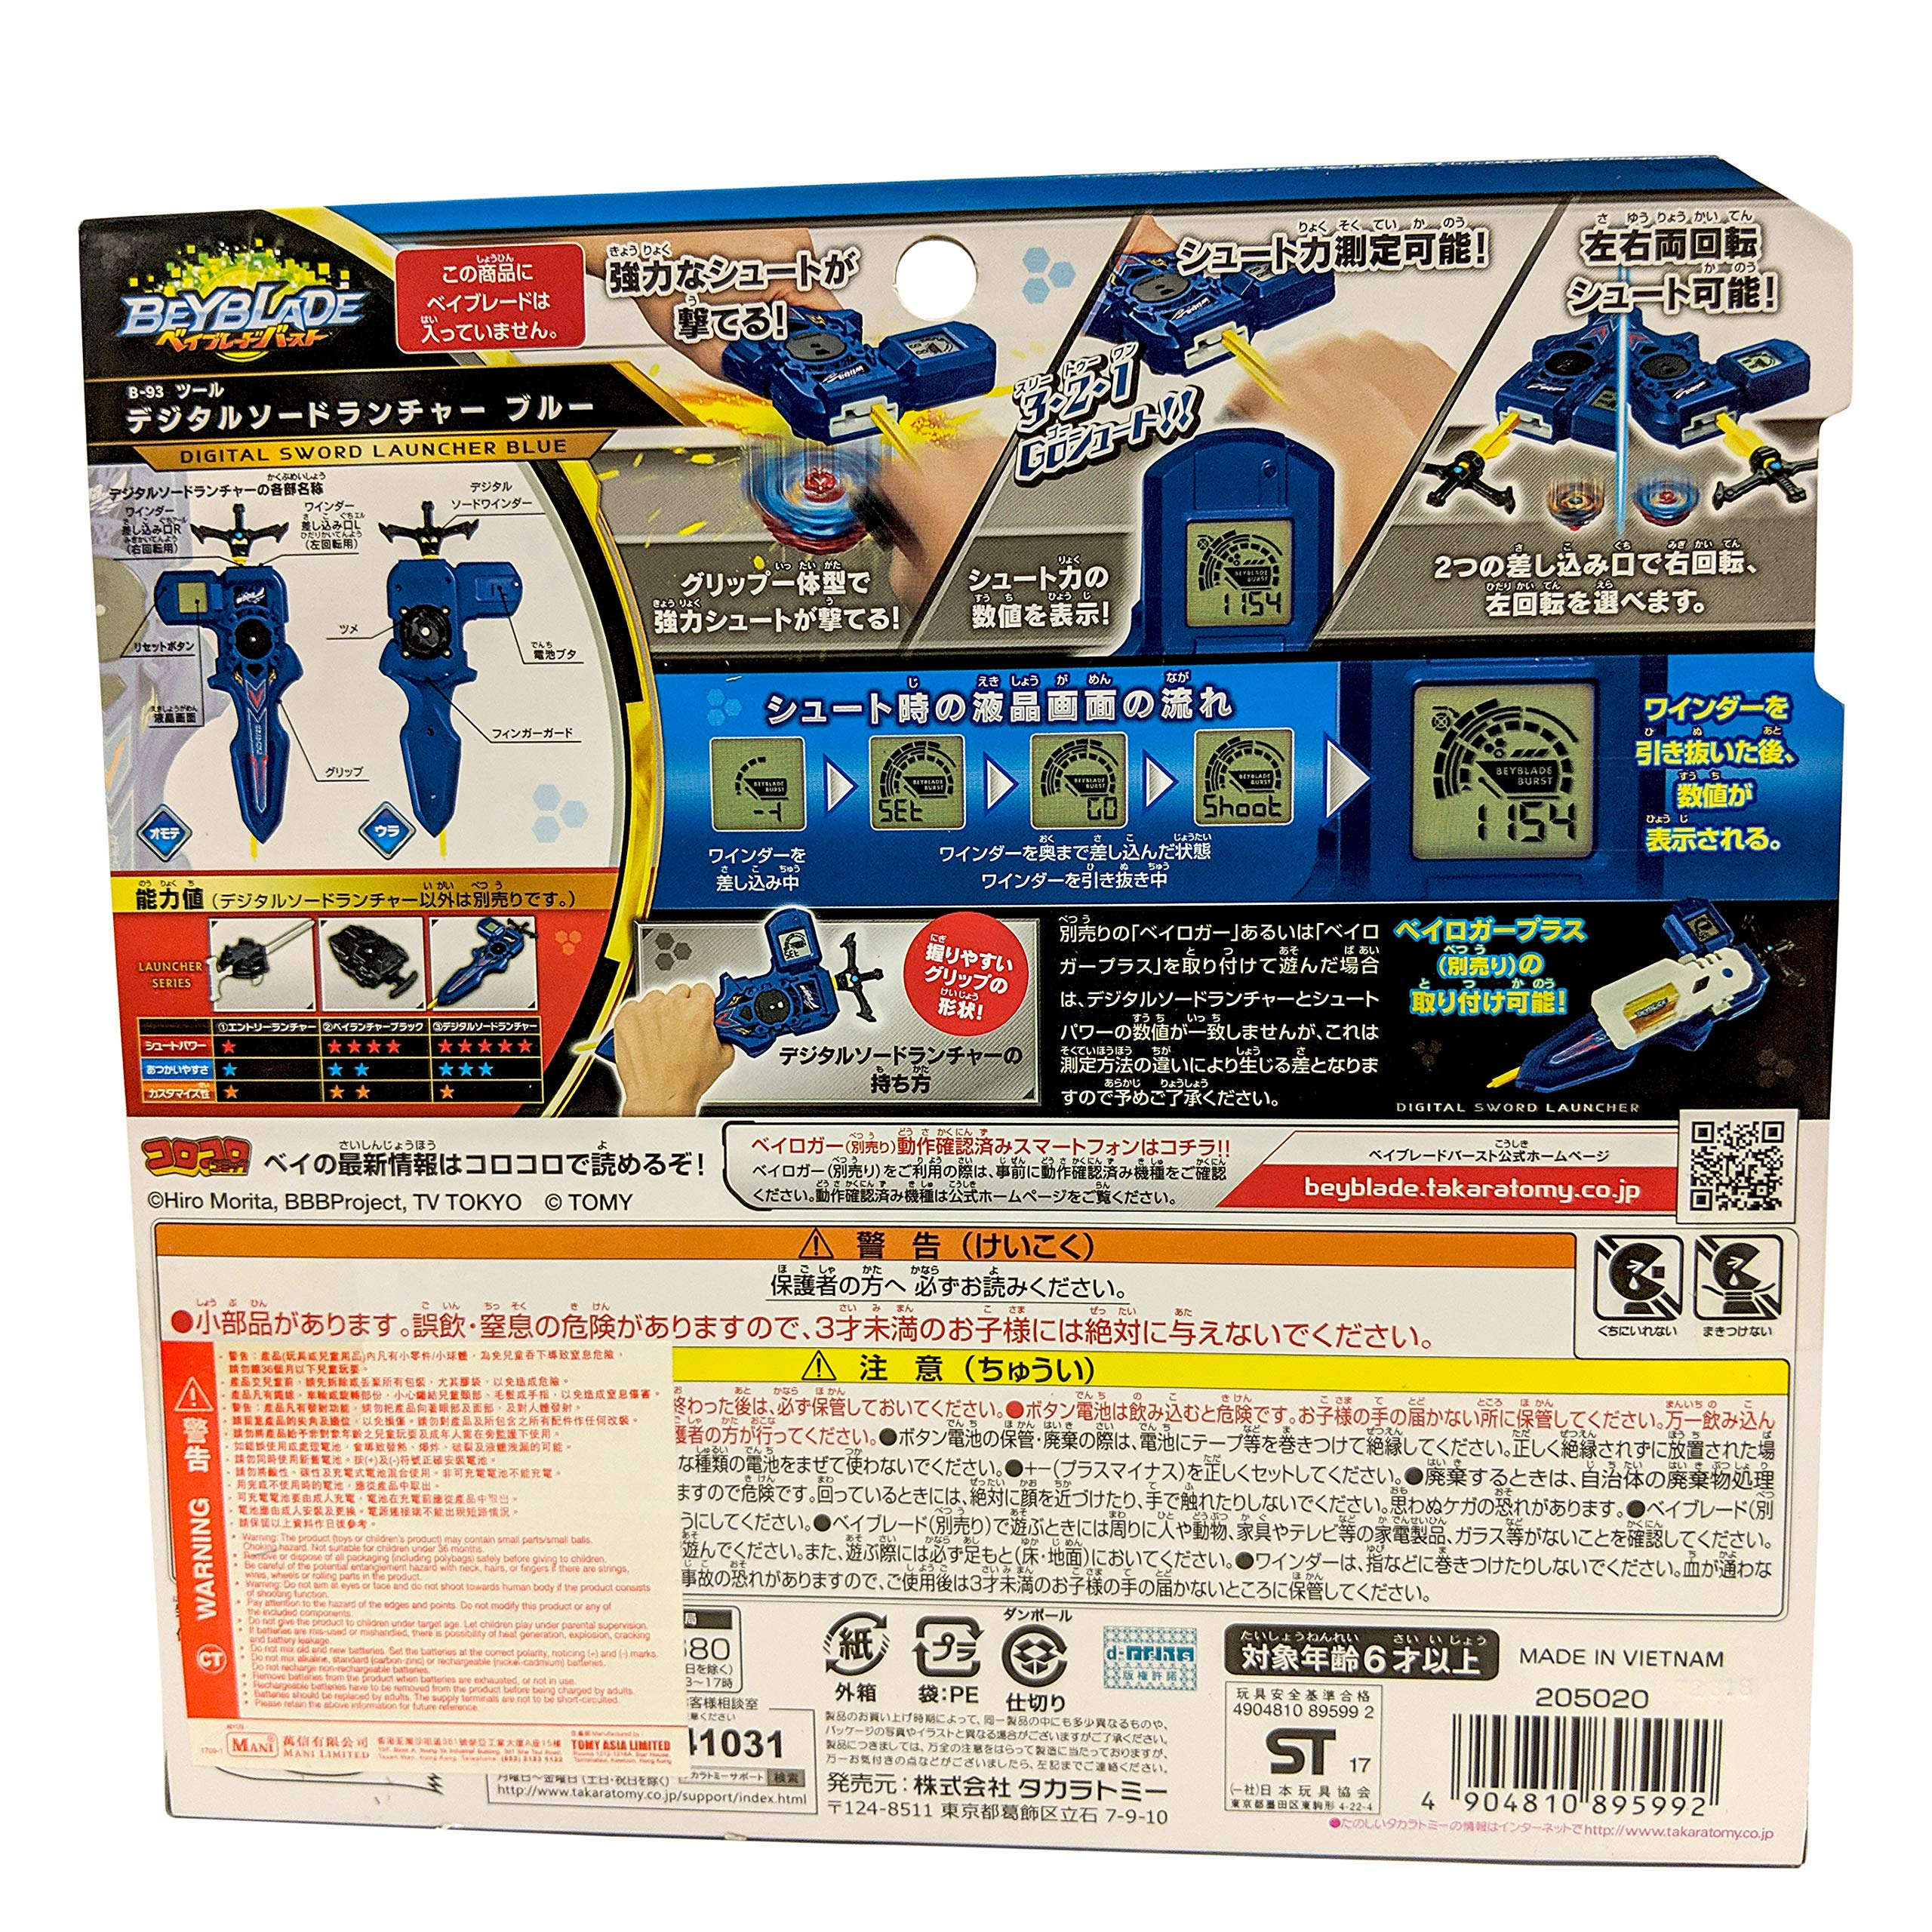 Takara Tomy B-93 Beyblade Burst Digital Sword Launcher Blue by Takaratomy (Image #4)